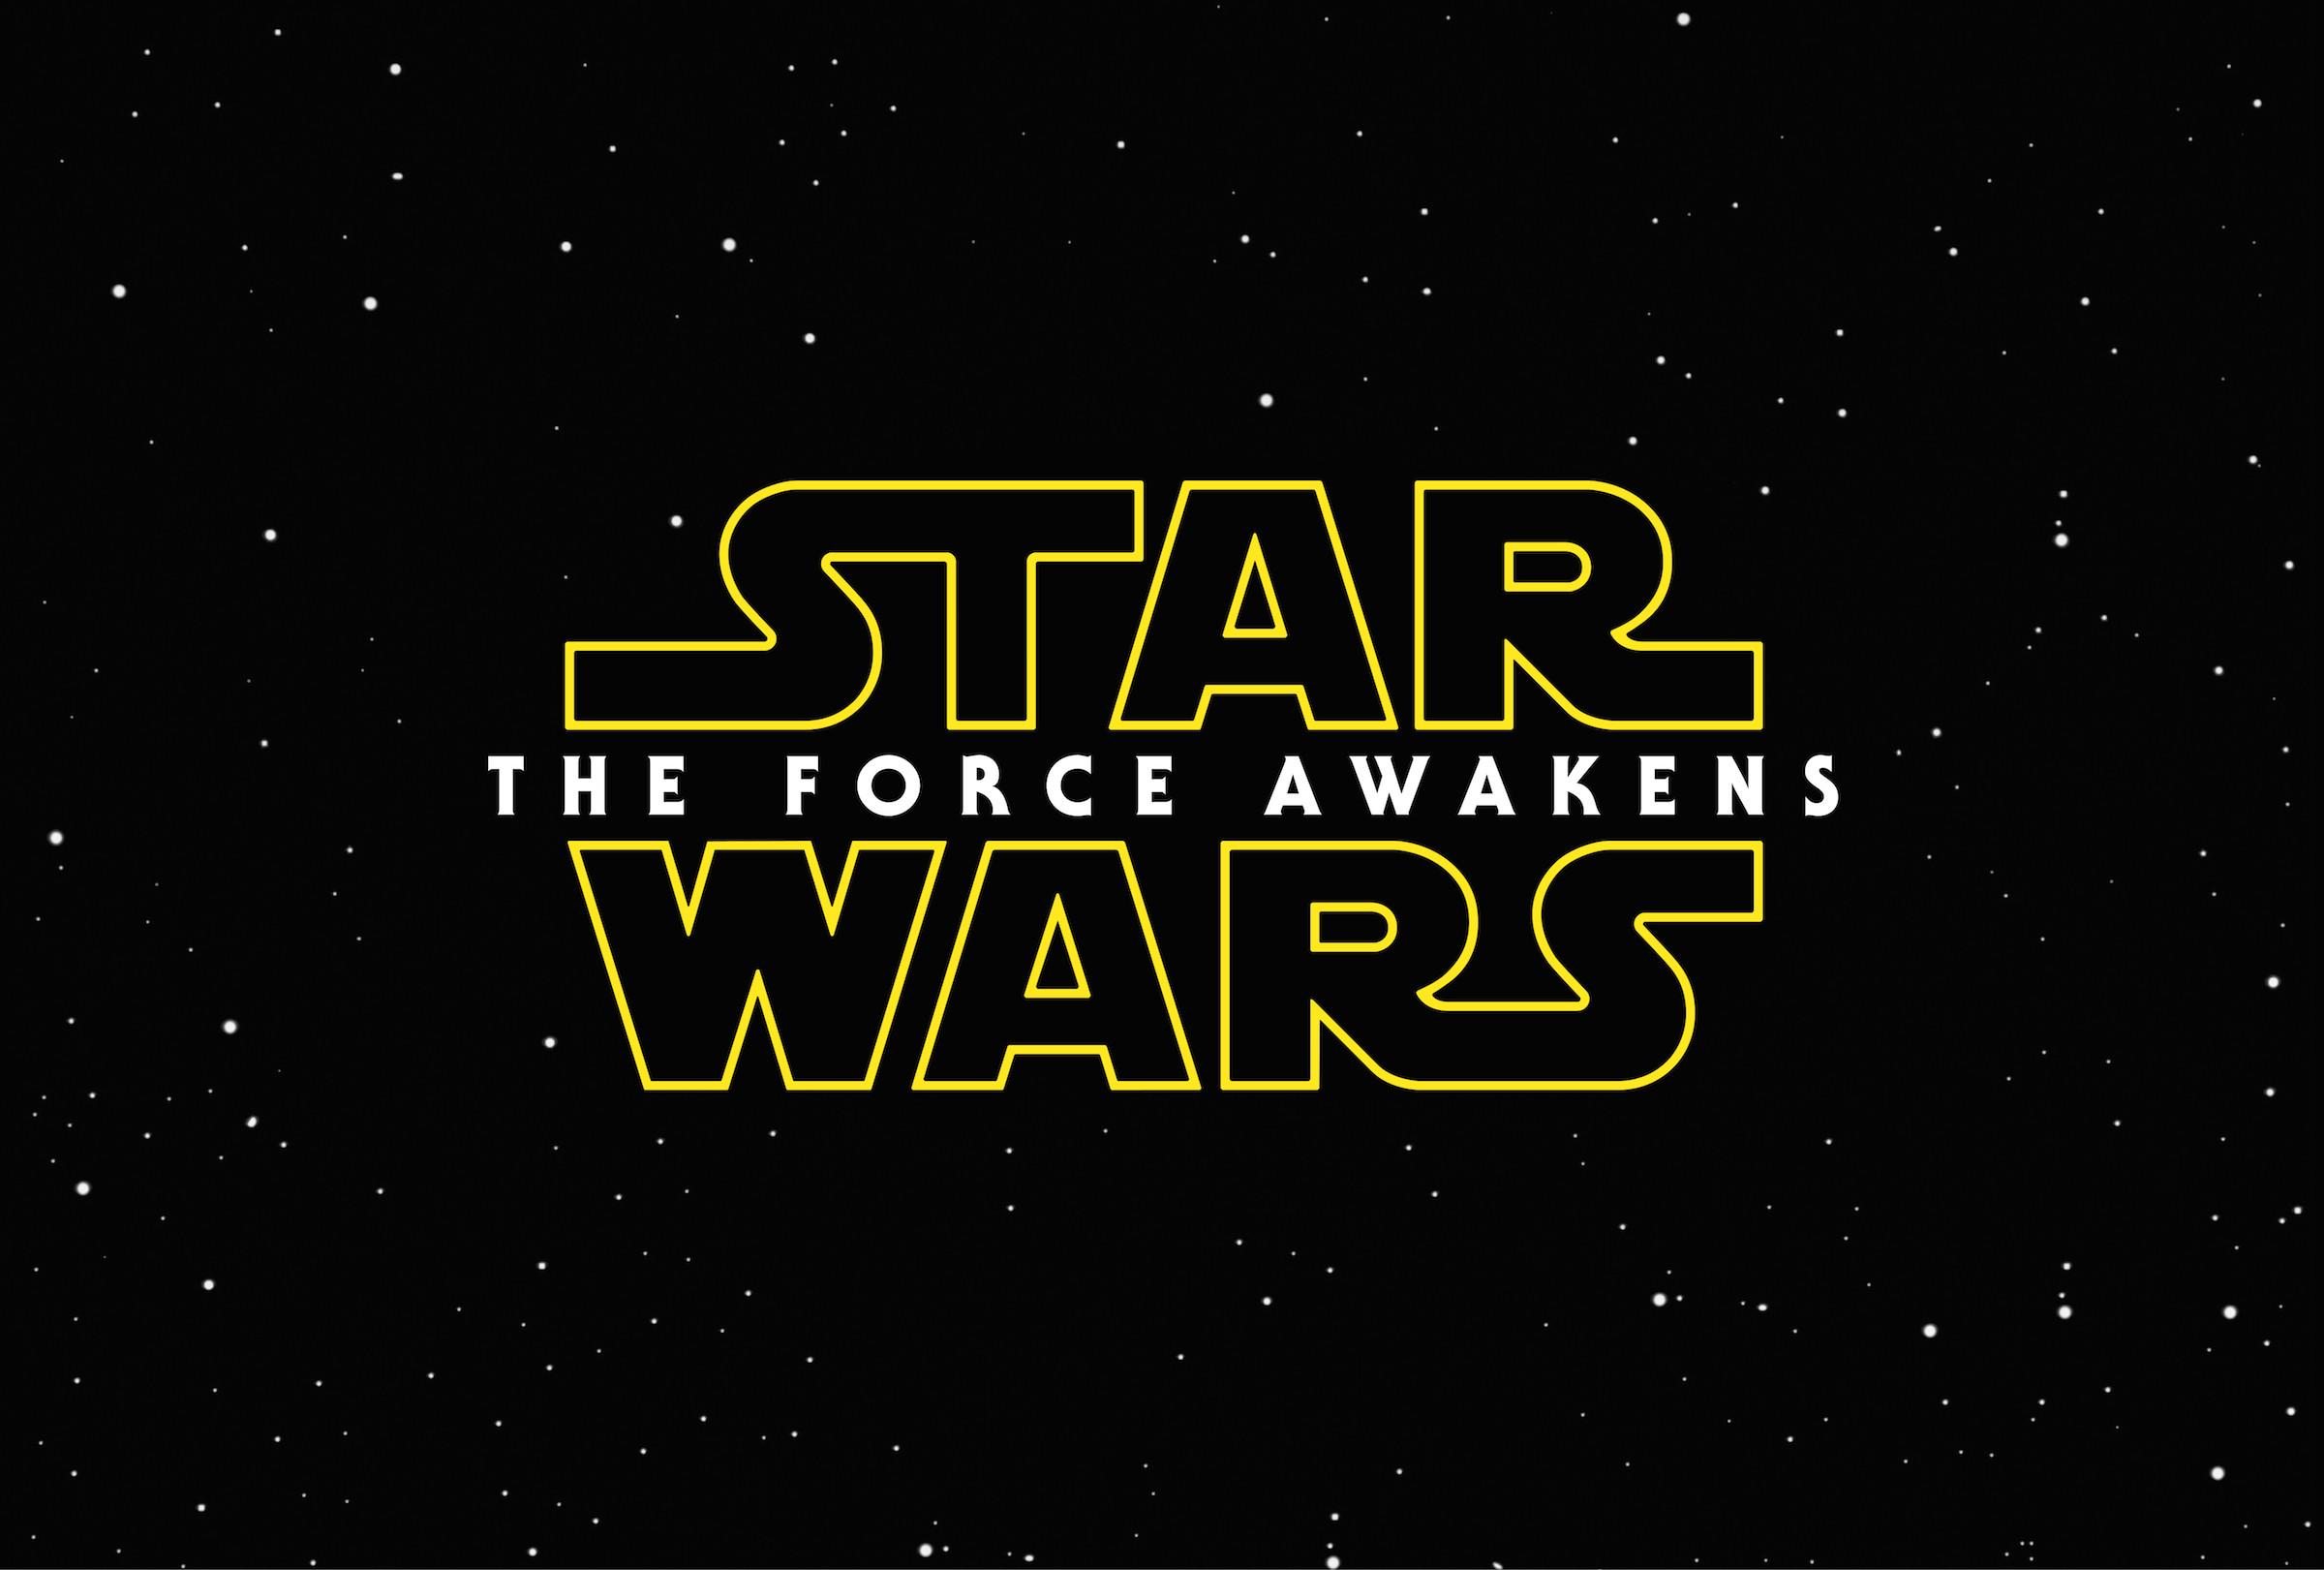 STAR THE FORCE AWAKENS